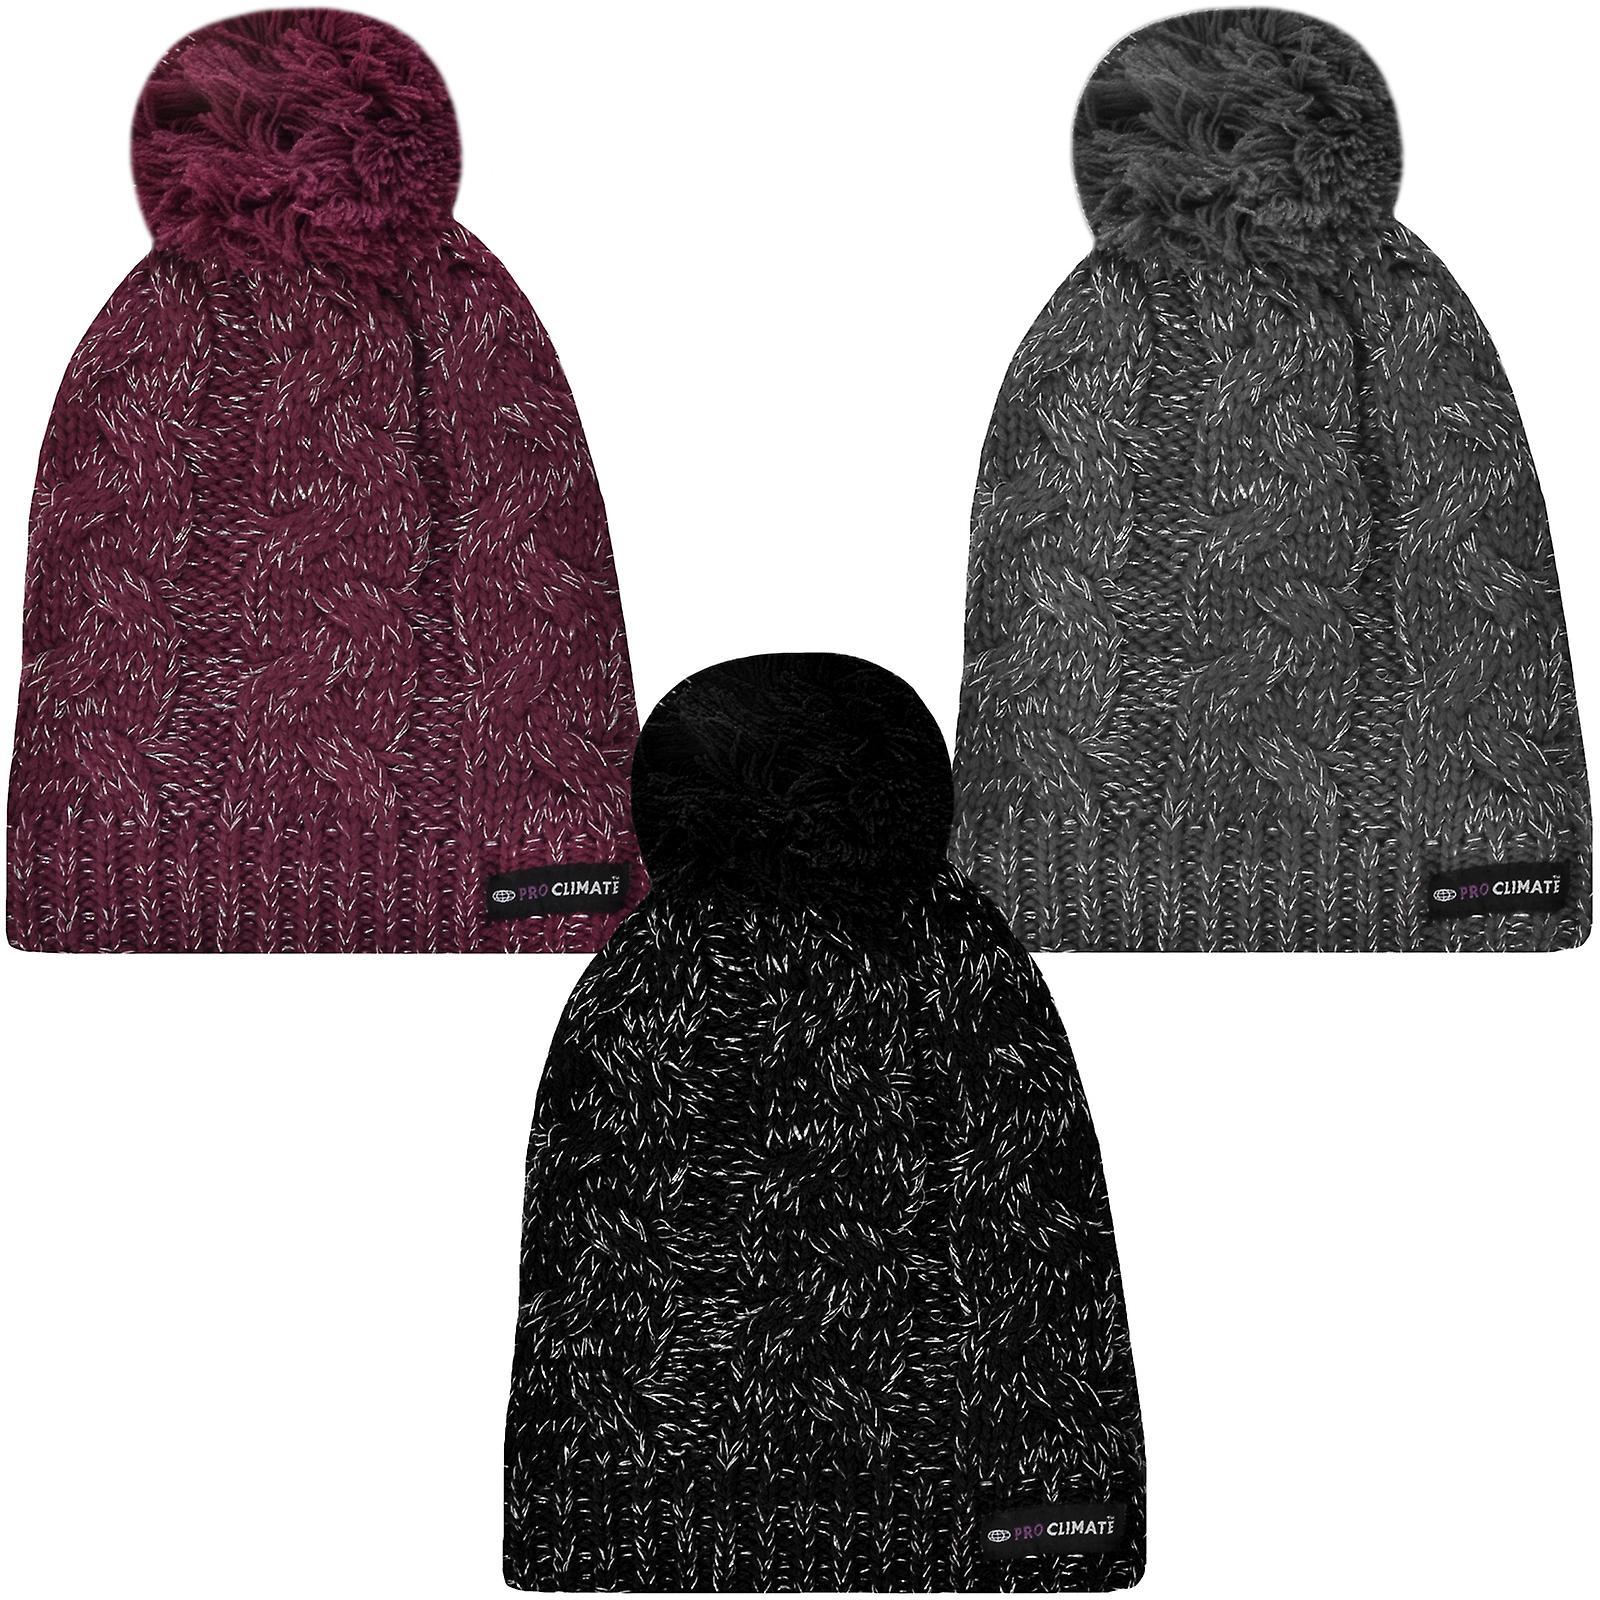 ProClimate Womens Thinsulate Waterproof Winter Knitted Beanie Pom Pom  Bobble Hat 0b69b05c869